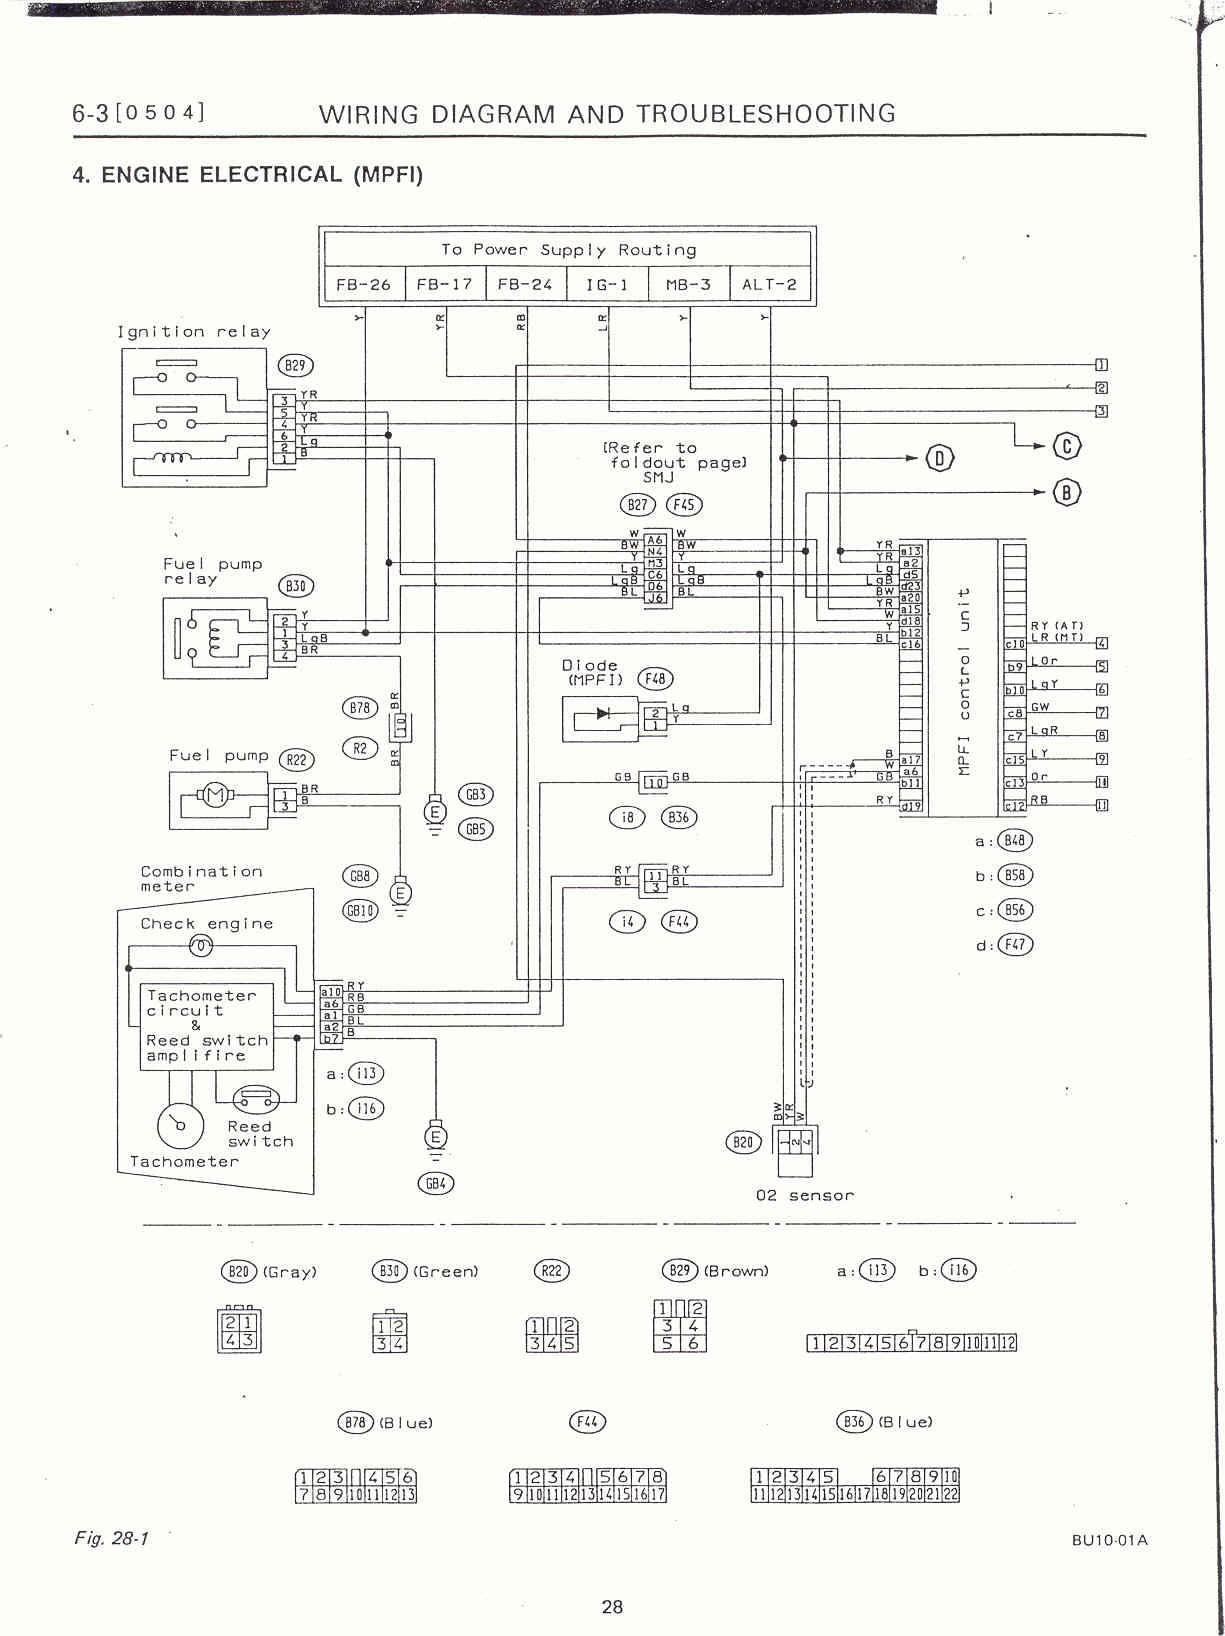 wiring diagram keystone outback 98 4runner factory radio engine 1996 subaru legacy best site